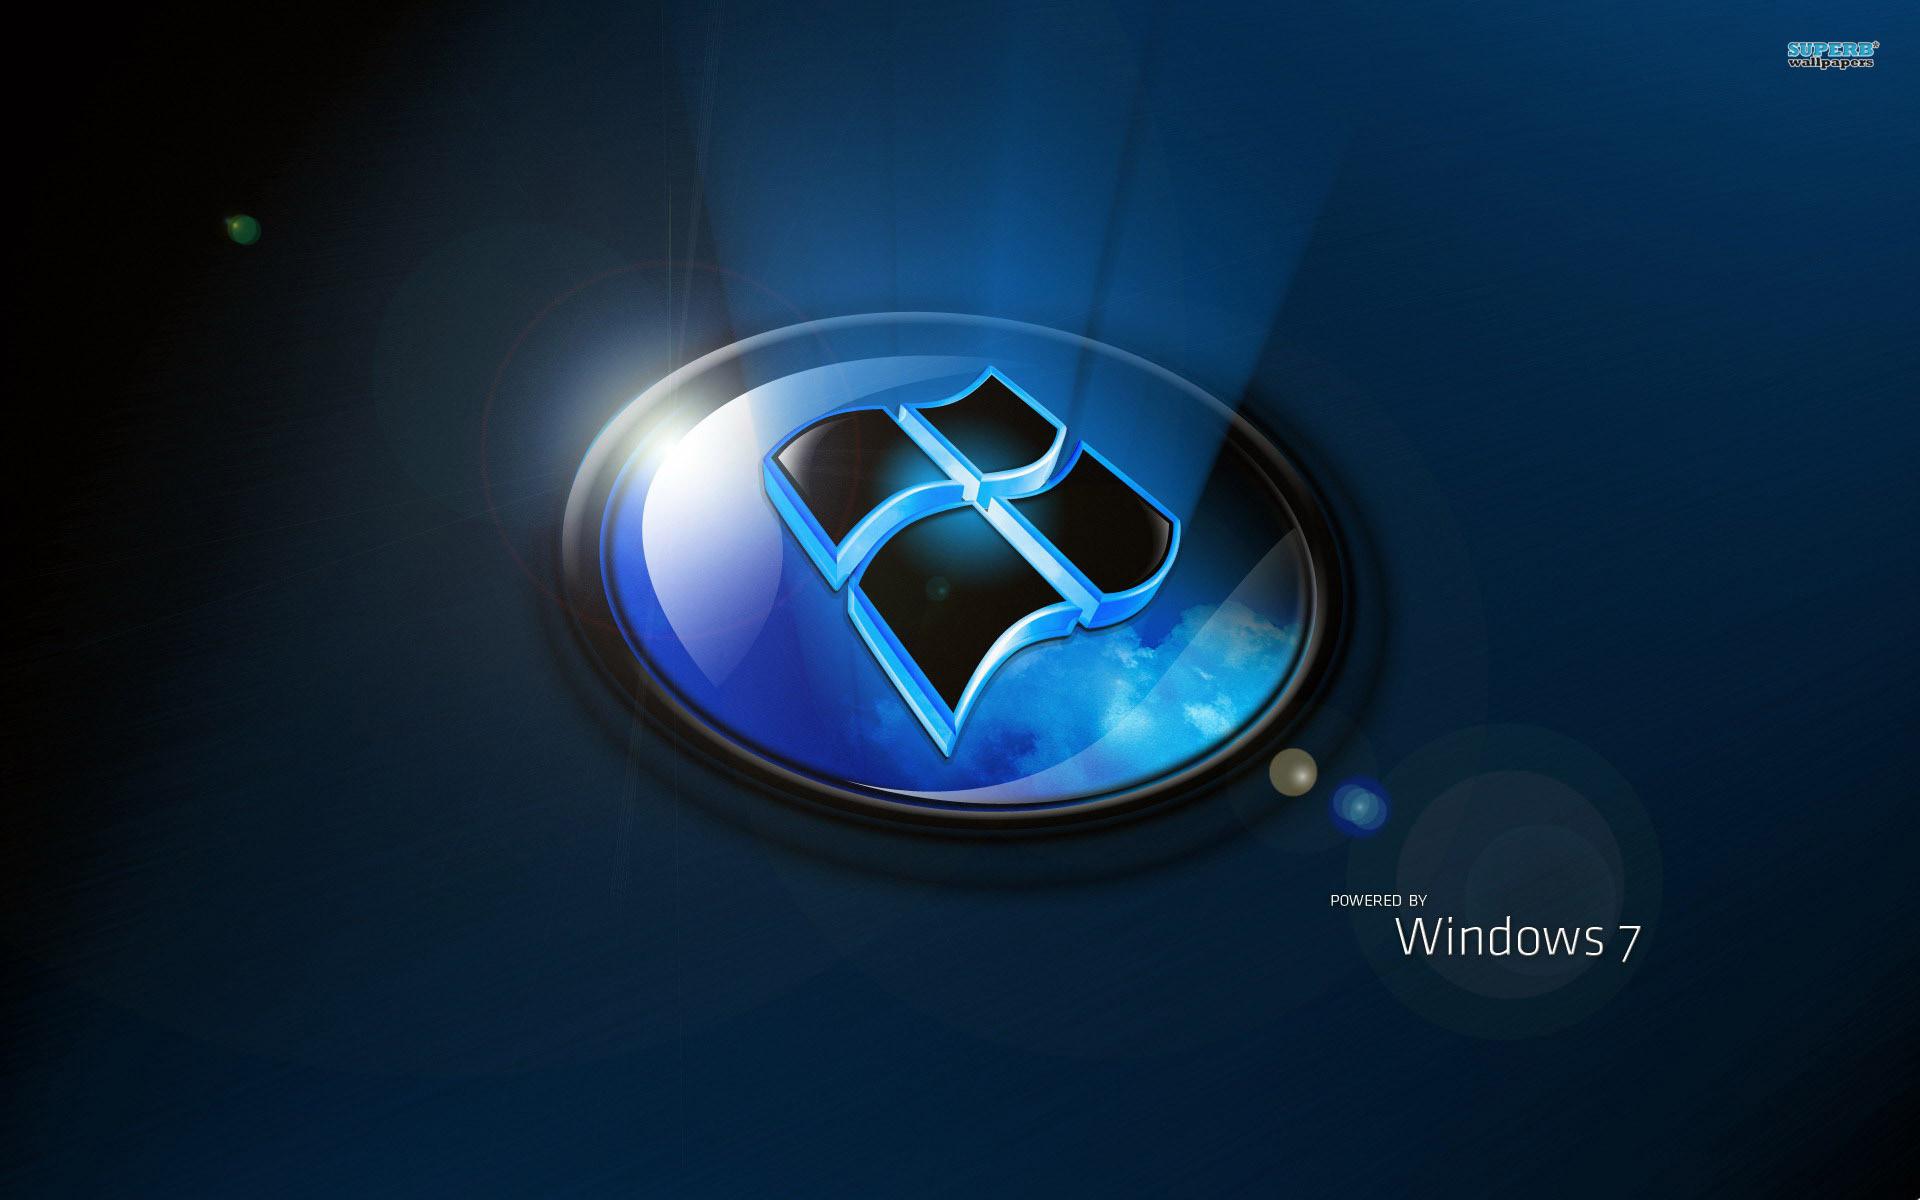 Windows 7 wallpaper 1920×1200